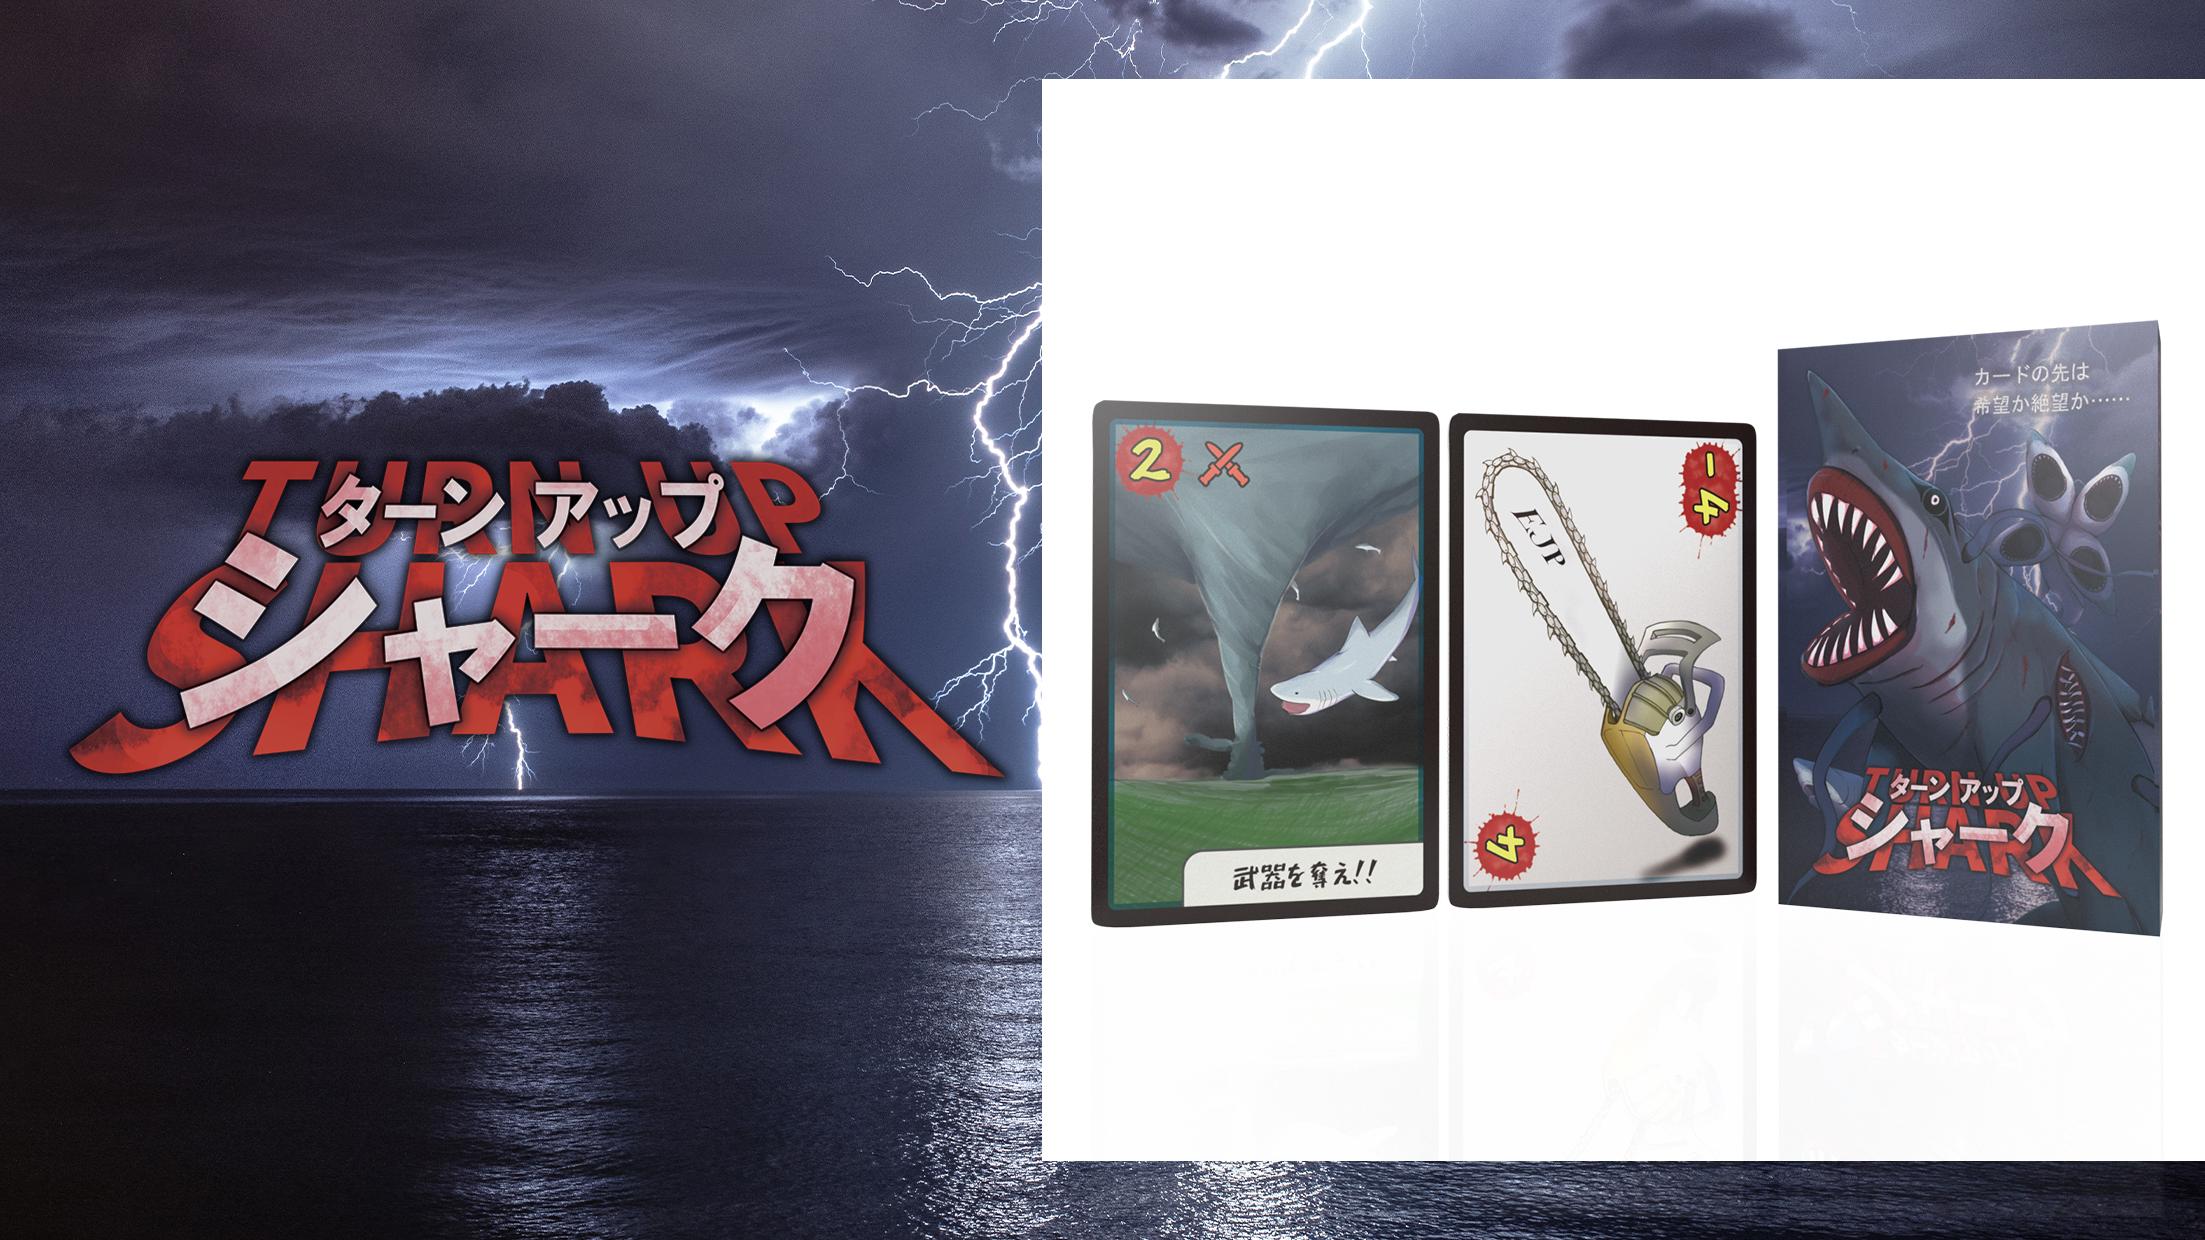 SNSで話題に即完売したB級サメ映画ボードゲーム「ターンアップシャーク」が増版分を予約開始。